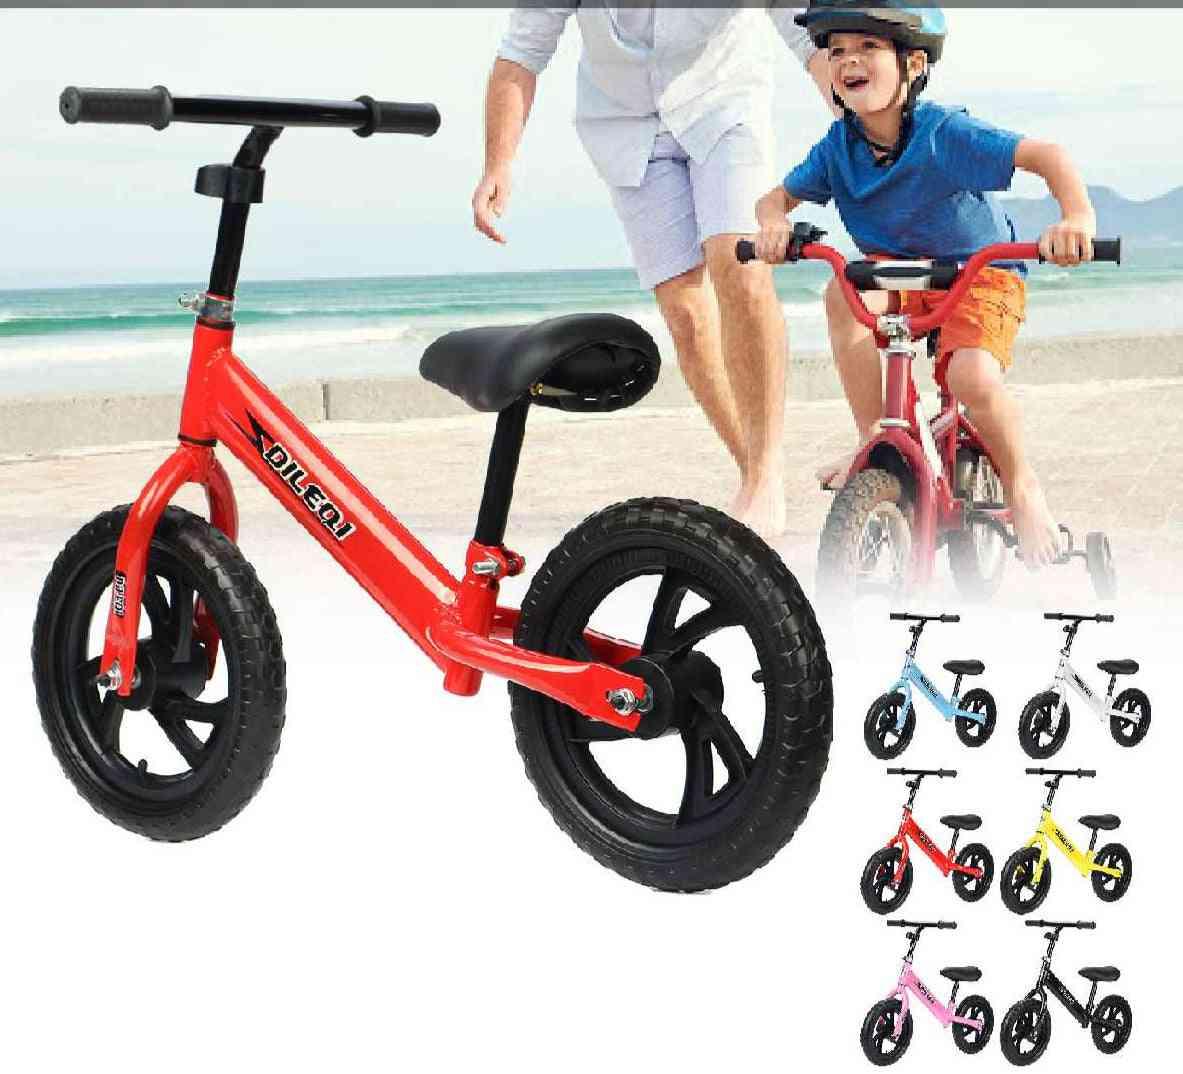 12inch Kid's Two-wheel Balance Bike